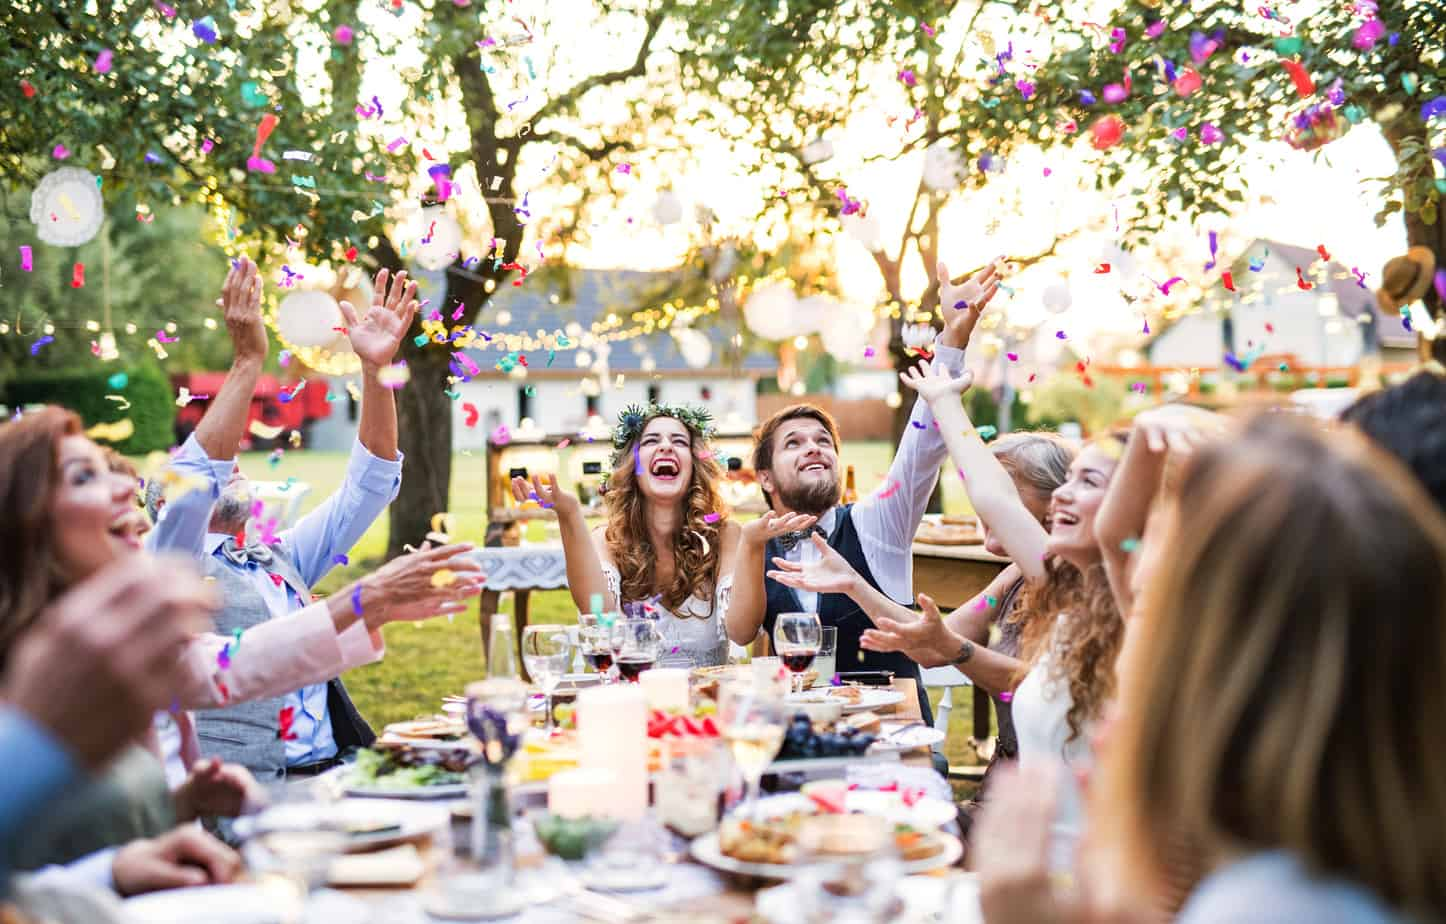 8 Party Tips for Summertime Entertaining